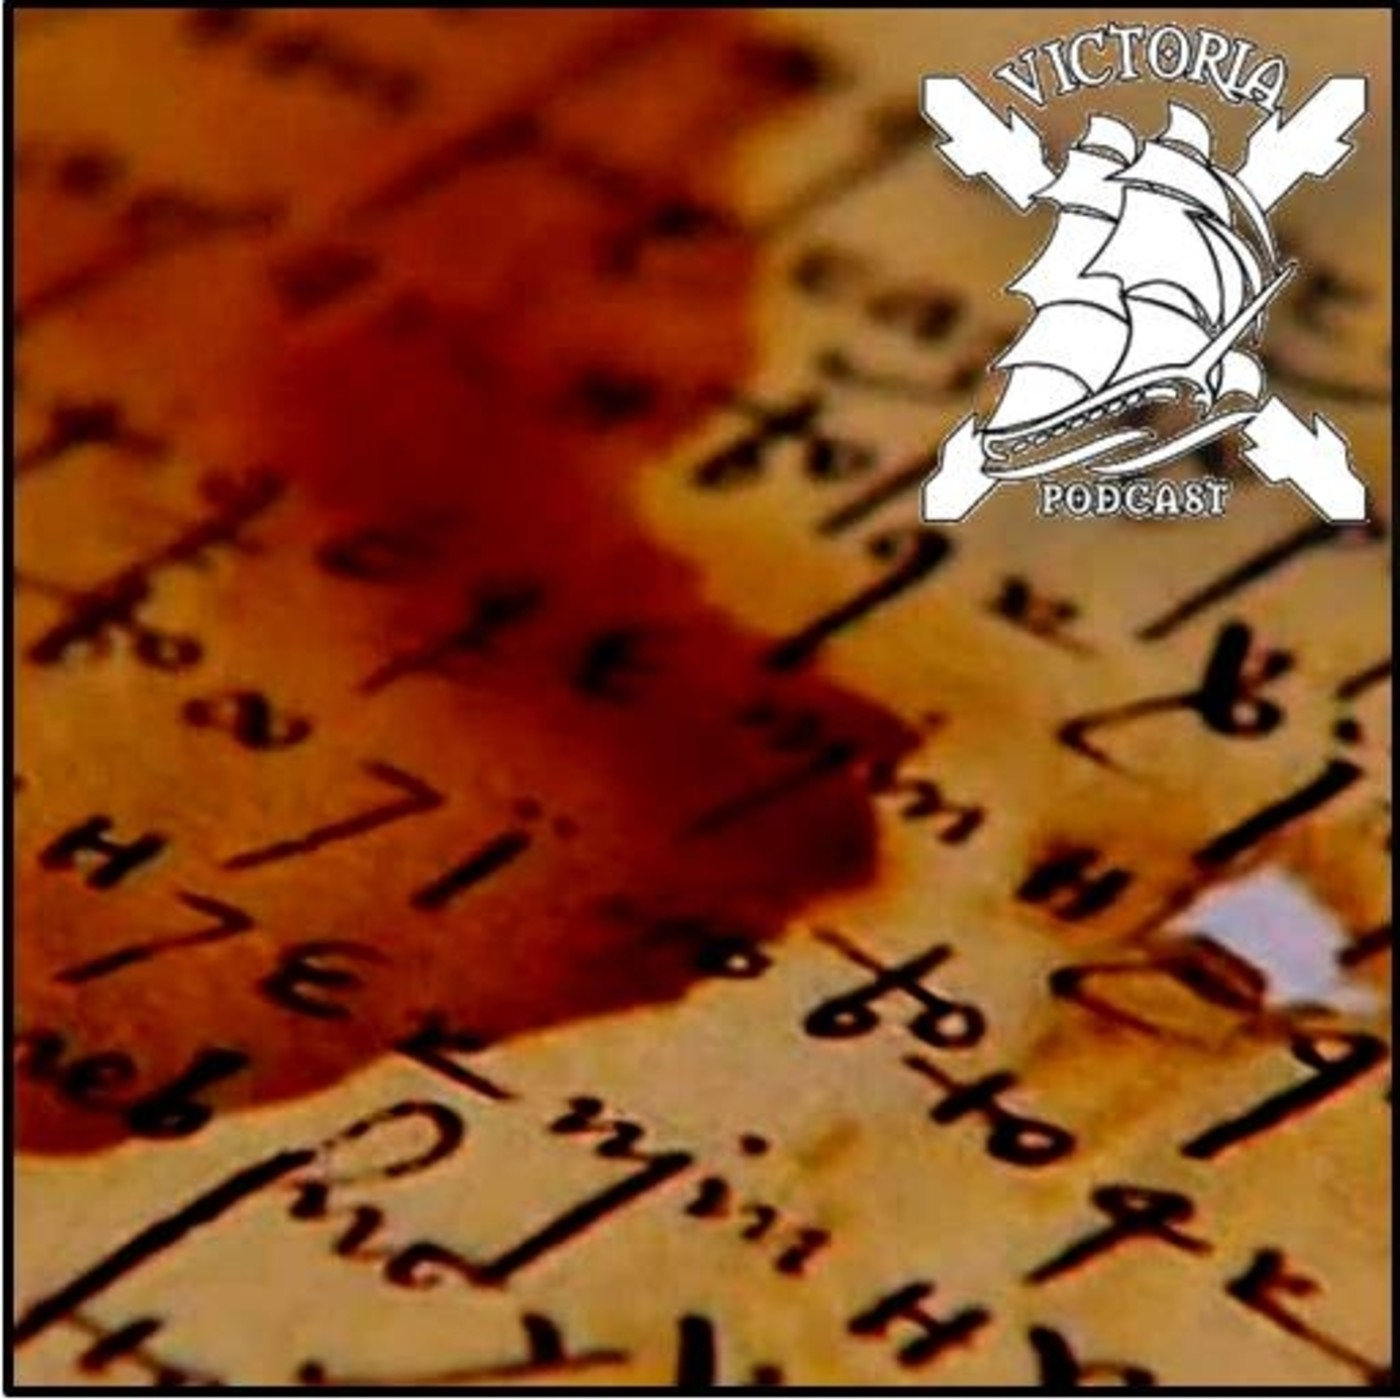 Memorias De Histo Belli Podcast